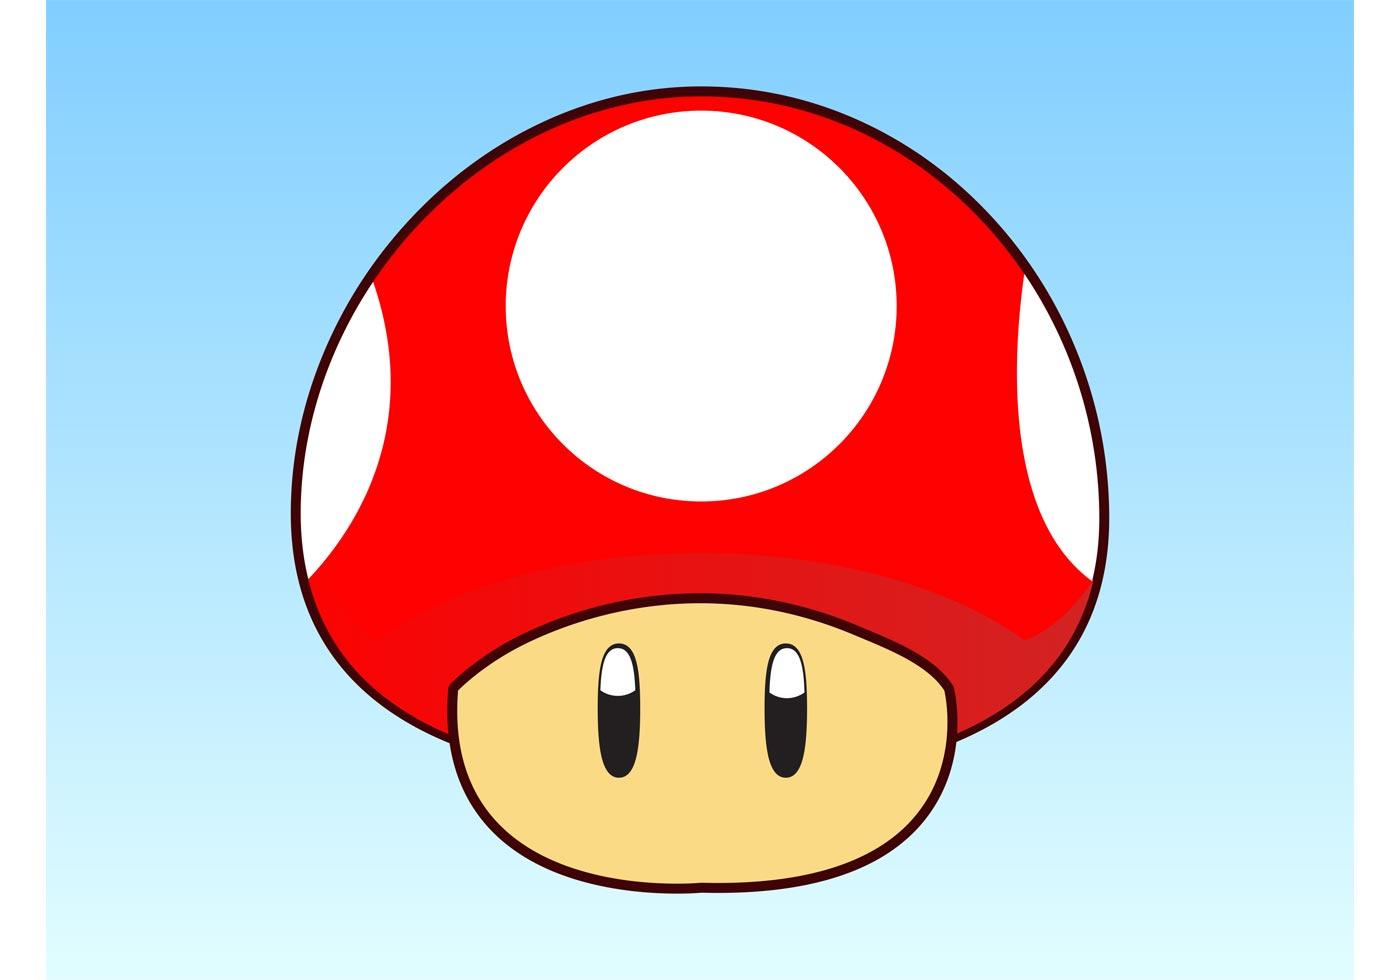 Mario Mushroom Nintendo Free Vector Art 5 Free Downloads